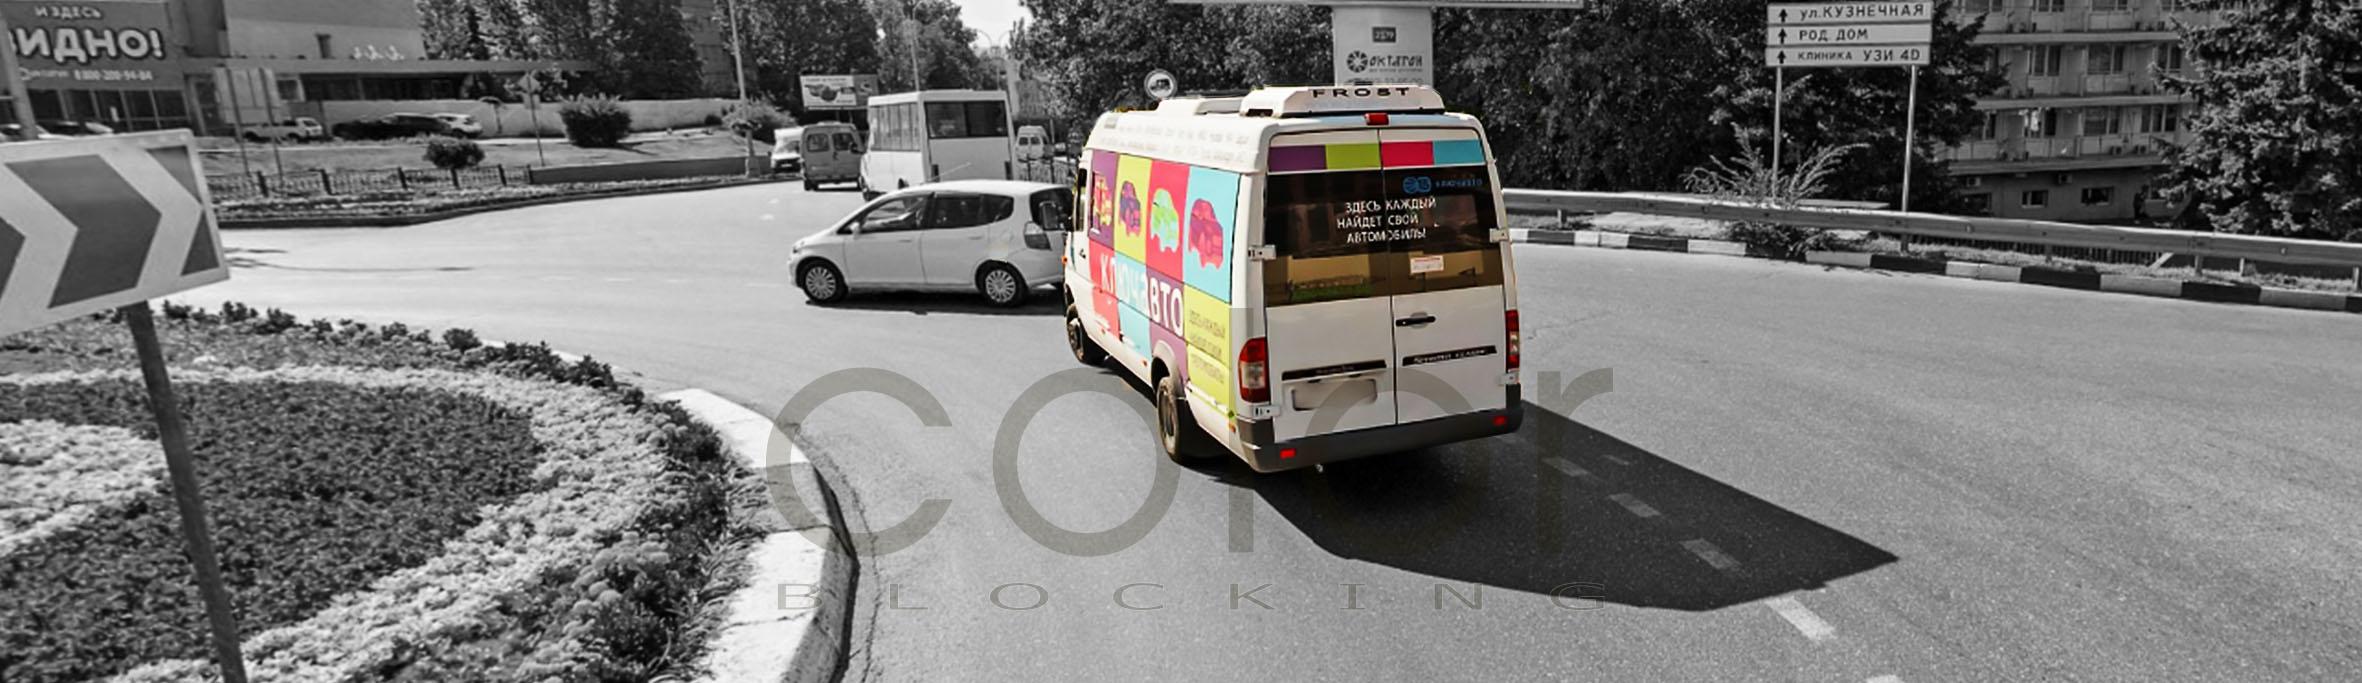 Реклама на транспорте в Пятигорске маршрутки